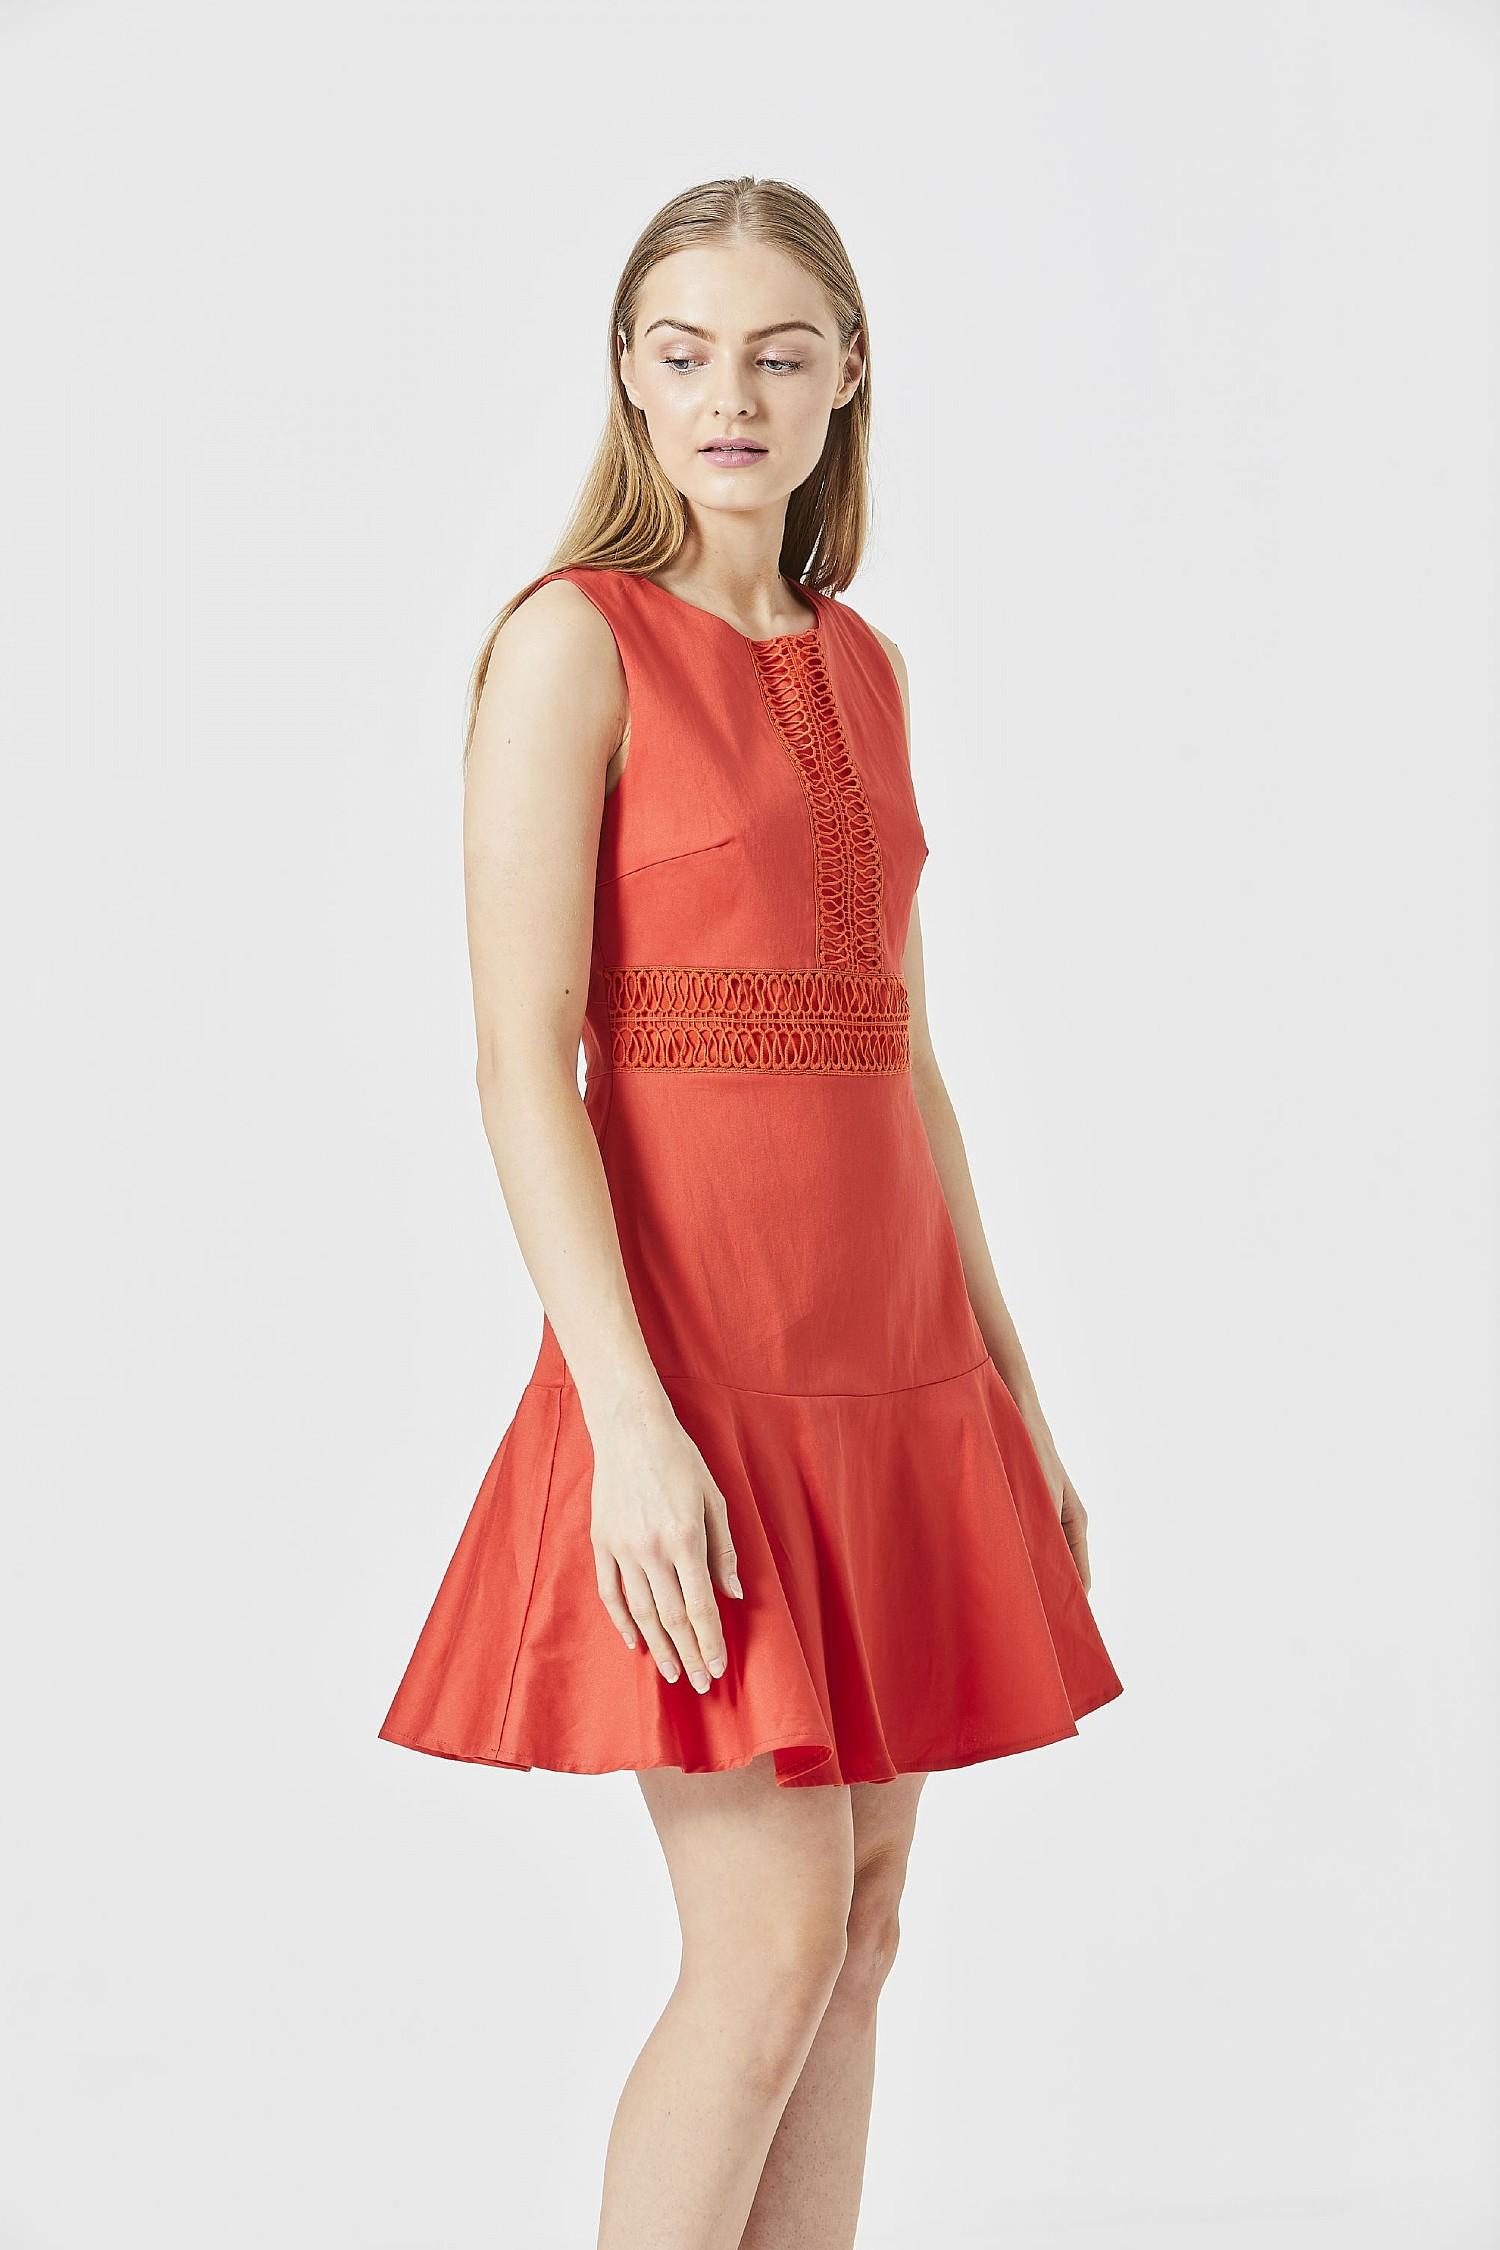 Red Sleeveless Lace Skater Mini Dress